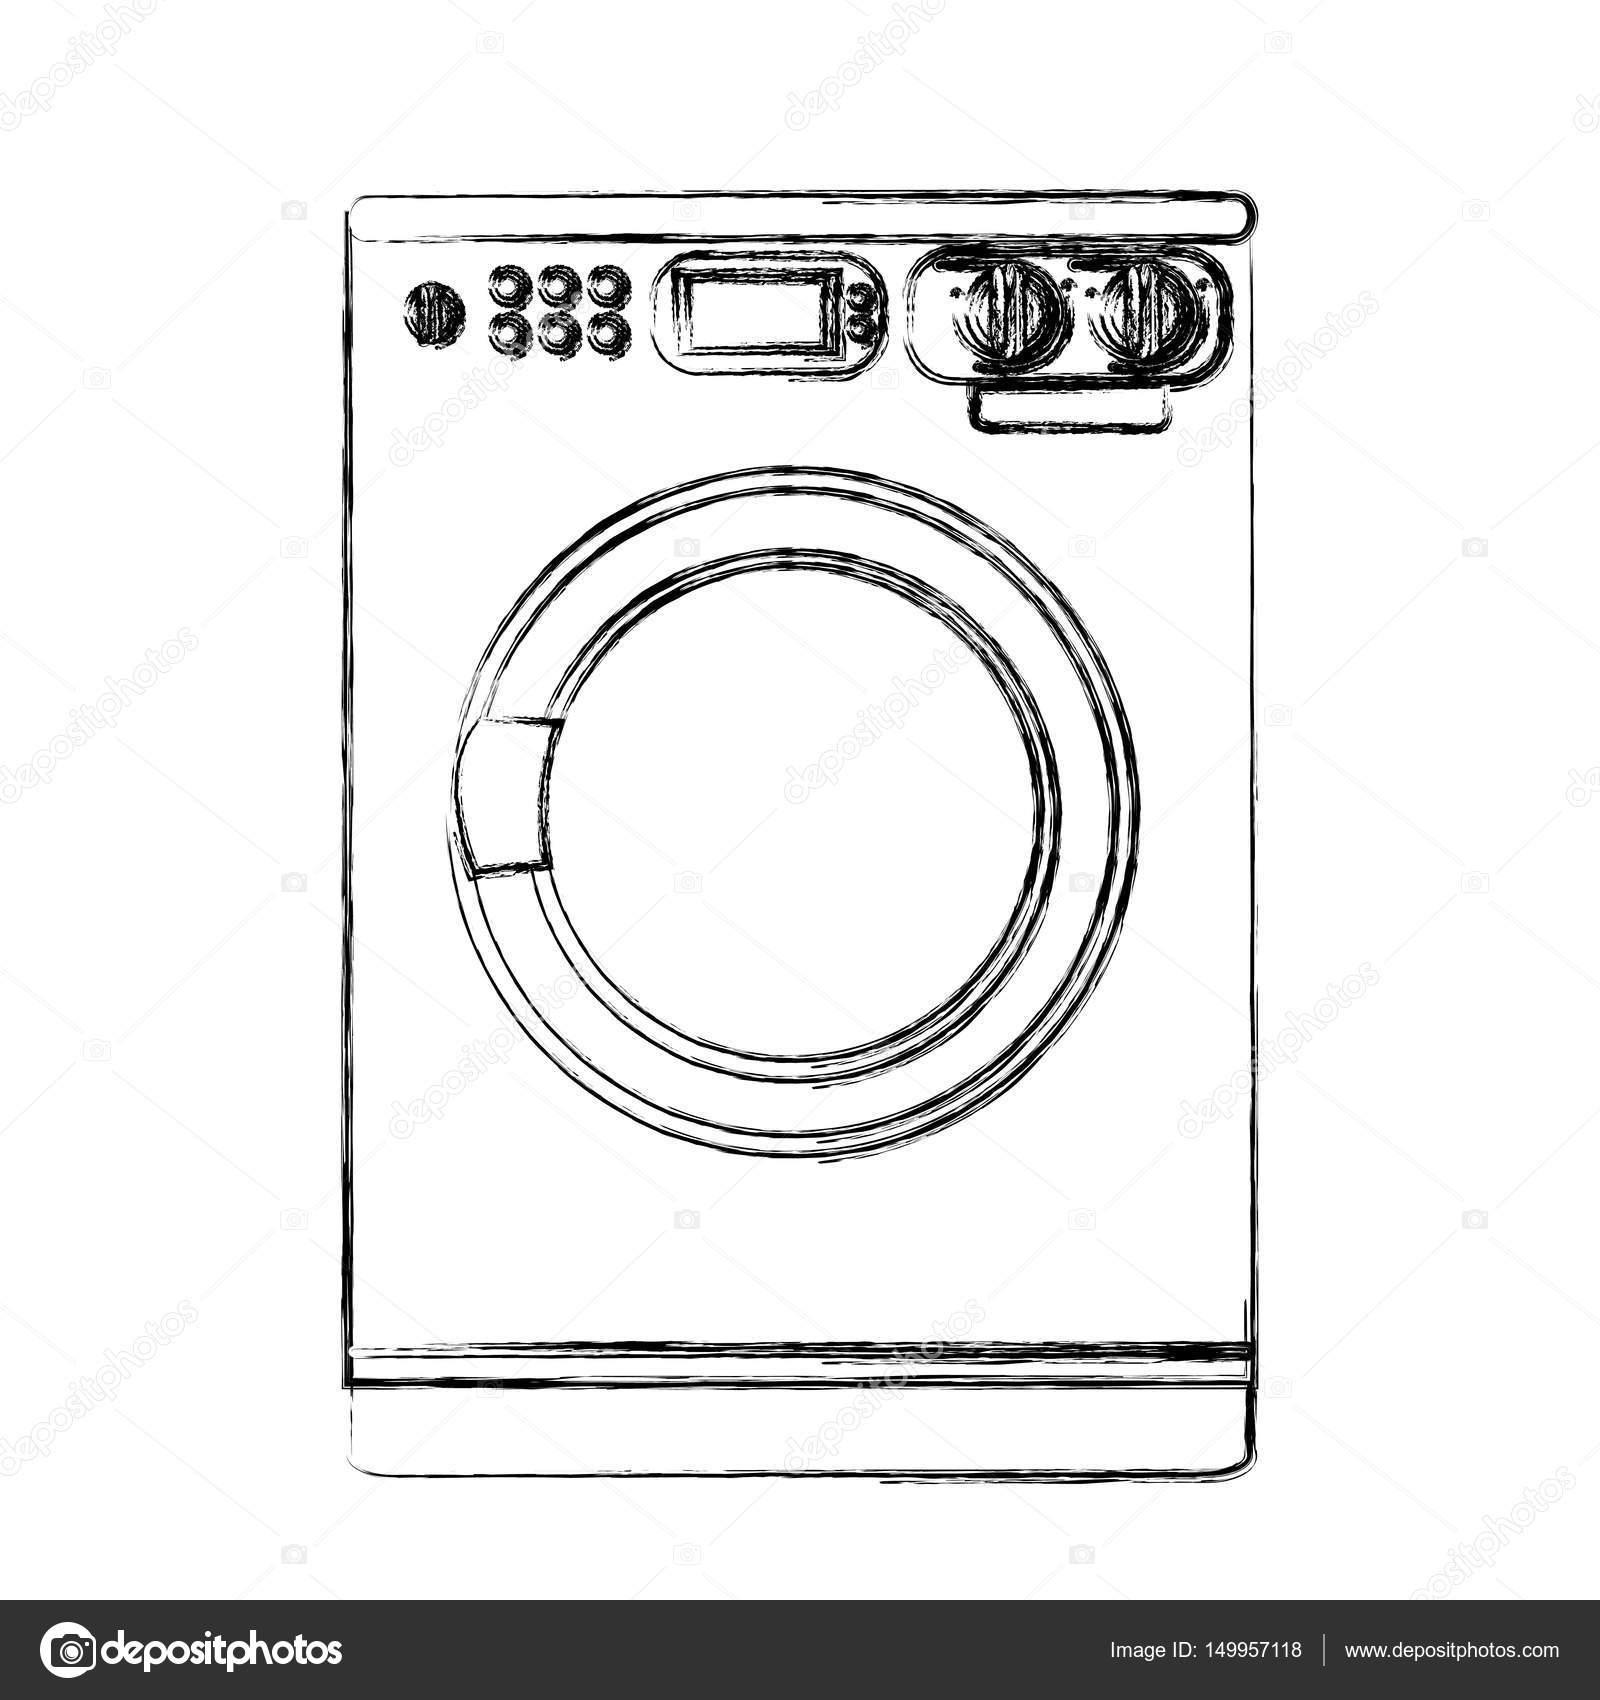 monochrome sketch of washing machine stock vector grgroupstock 149957118. Black Bedroom Furniture Sets. Home Design Ideas